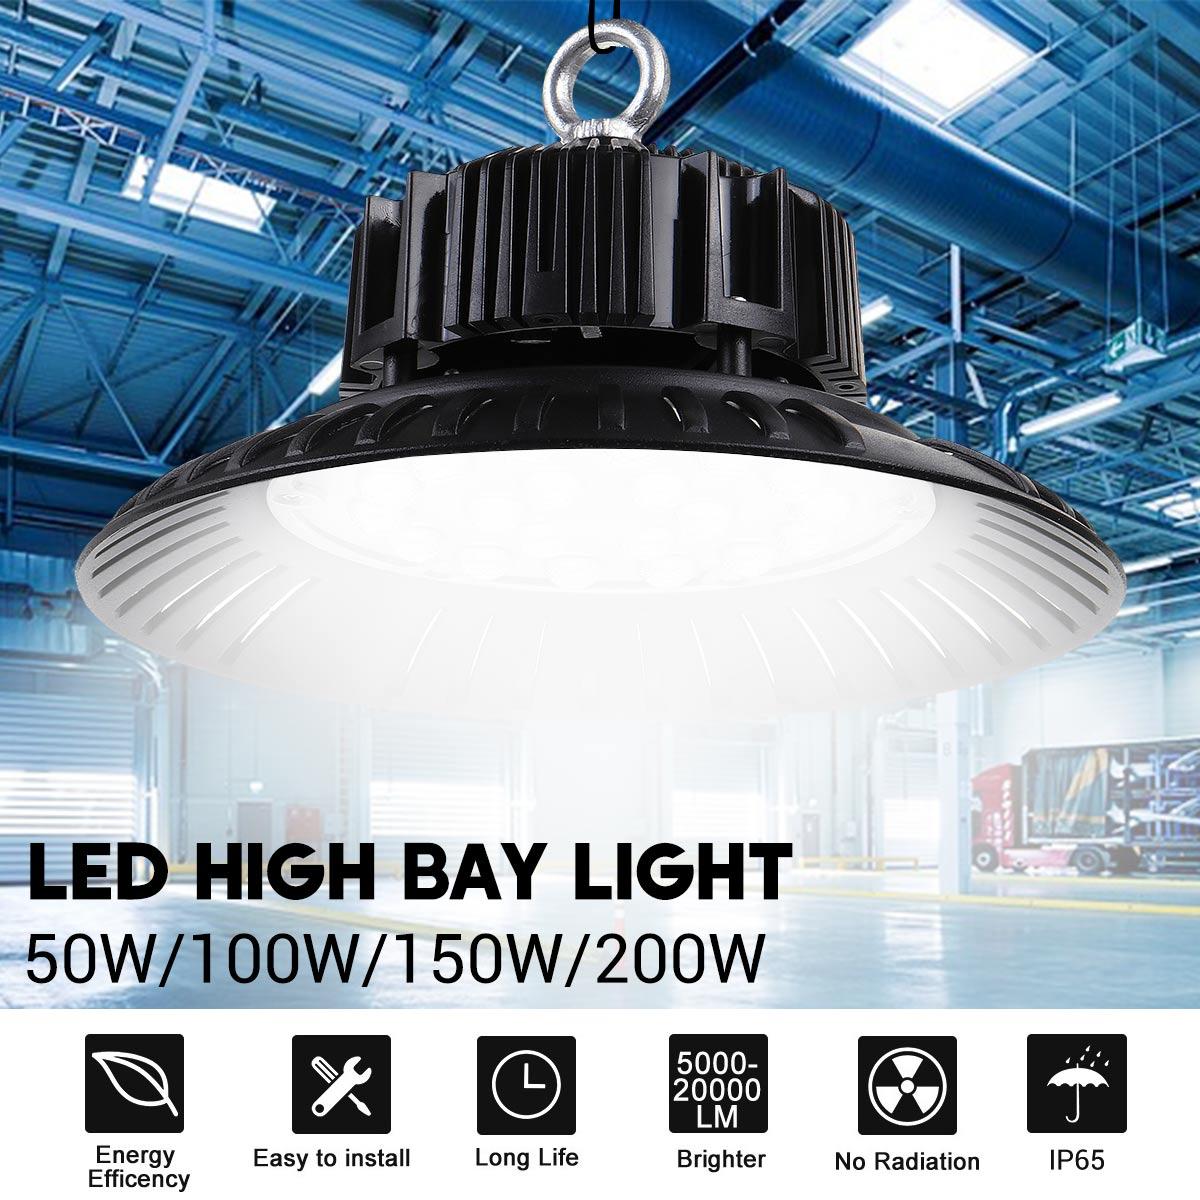 Ufo LED yüksek raf lambası su geçirmez IP65 depo atölyesi garaj endüstriyel lamba stadyum pazarı havaalanı LED garaj ışığı